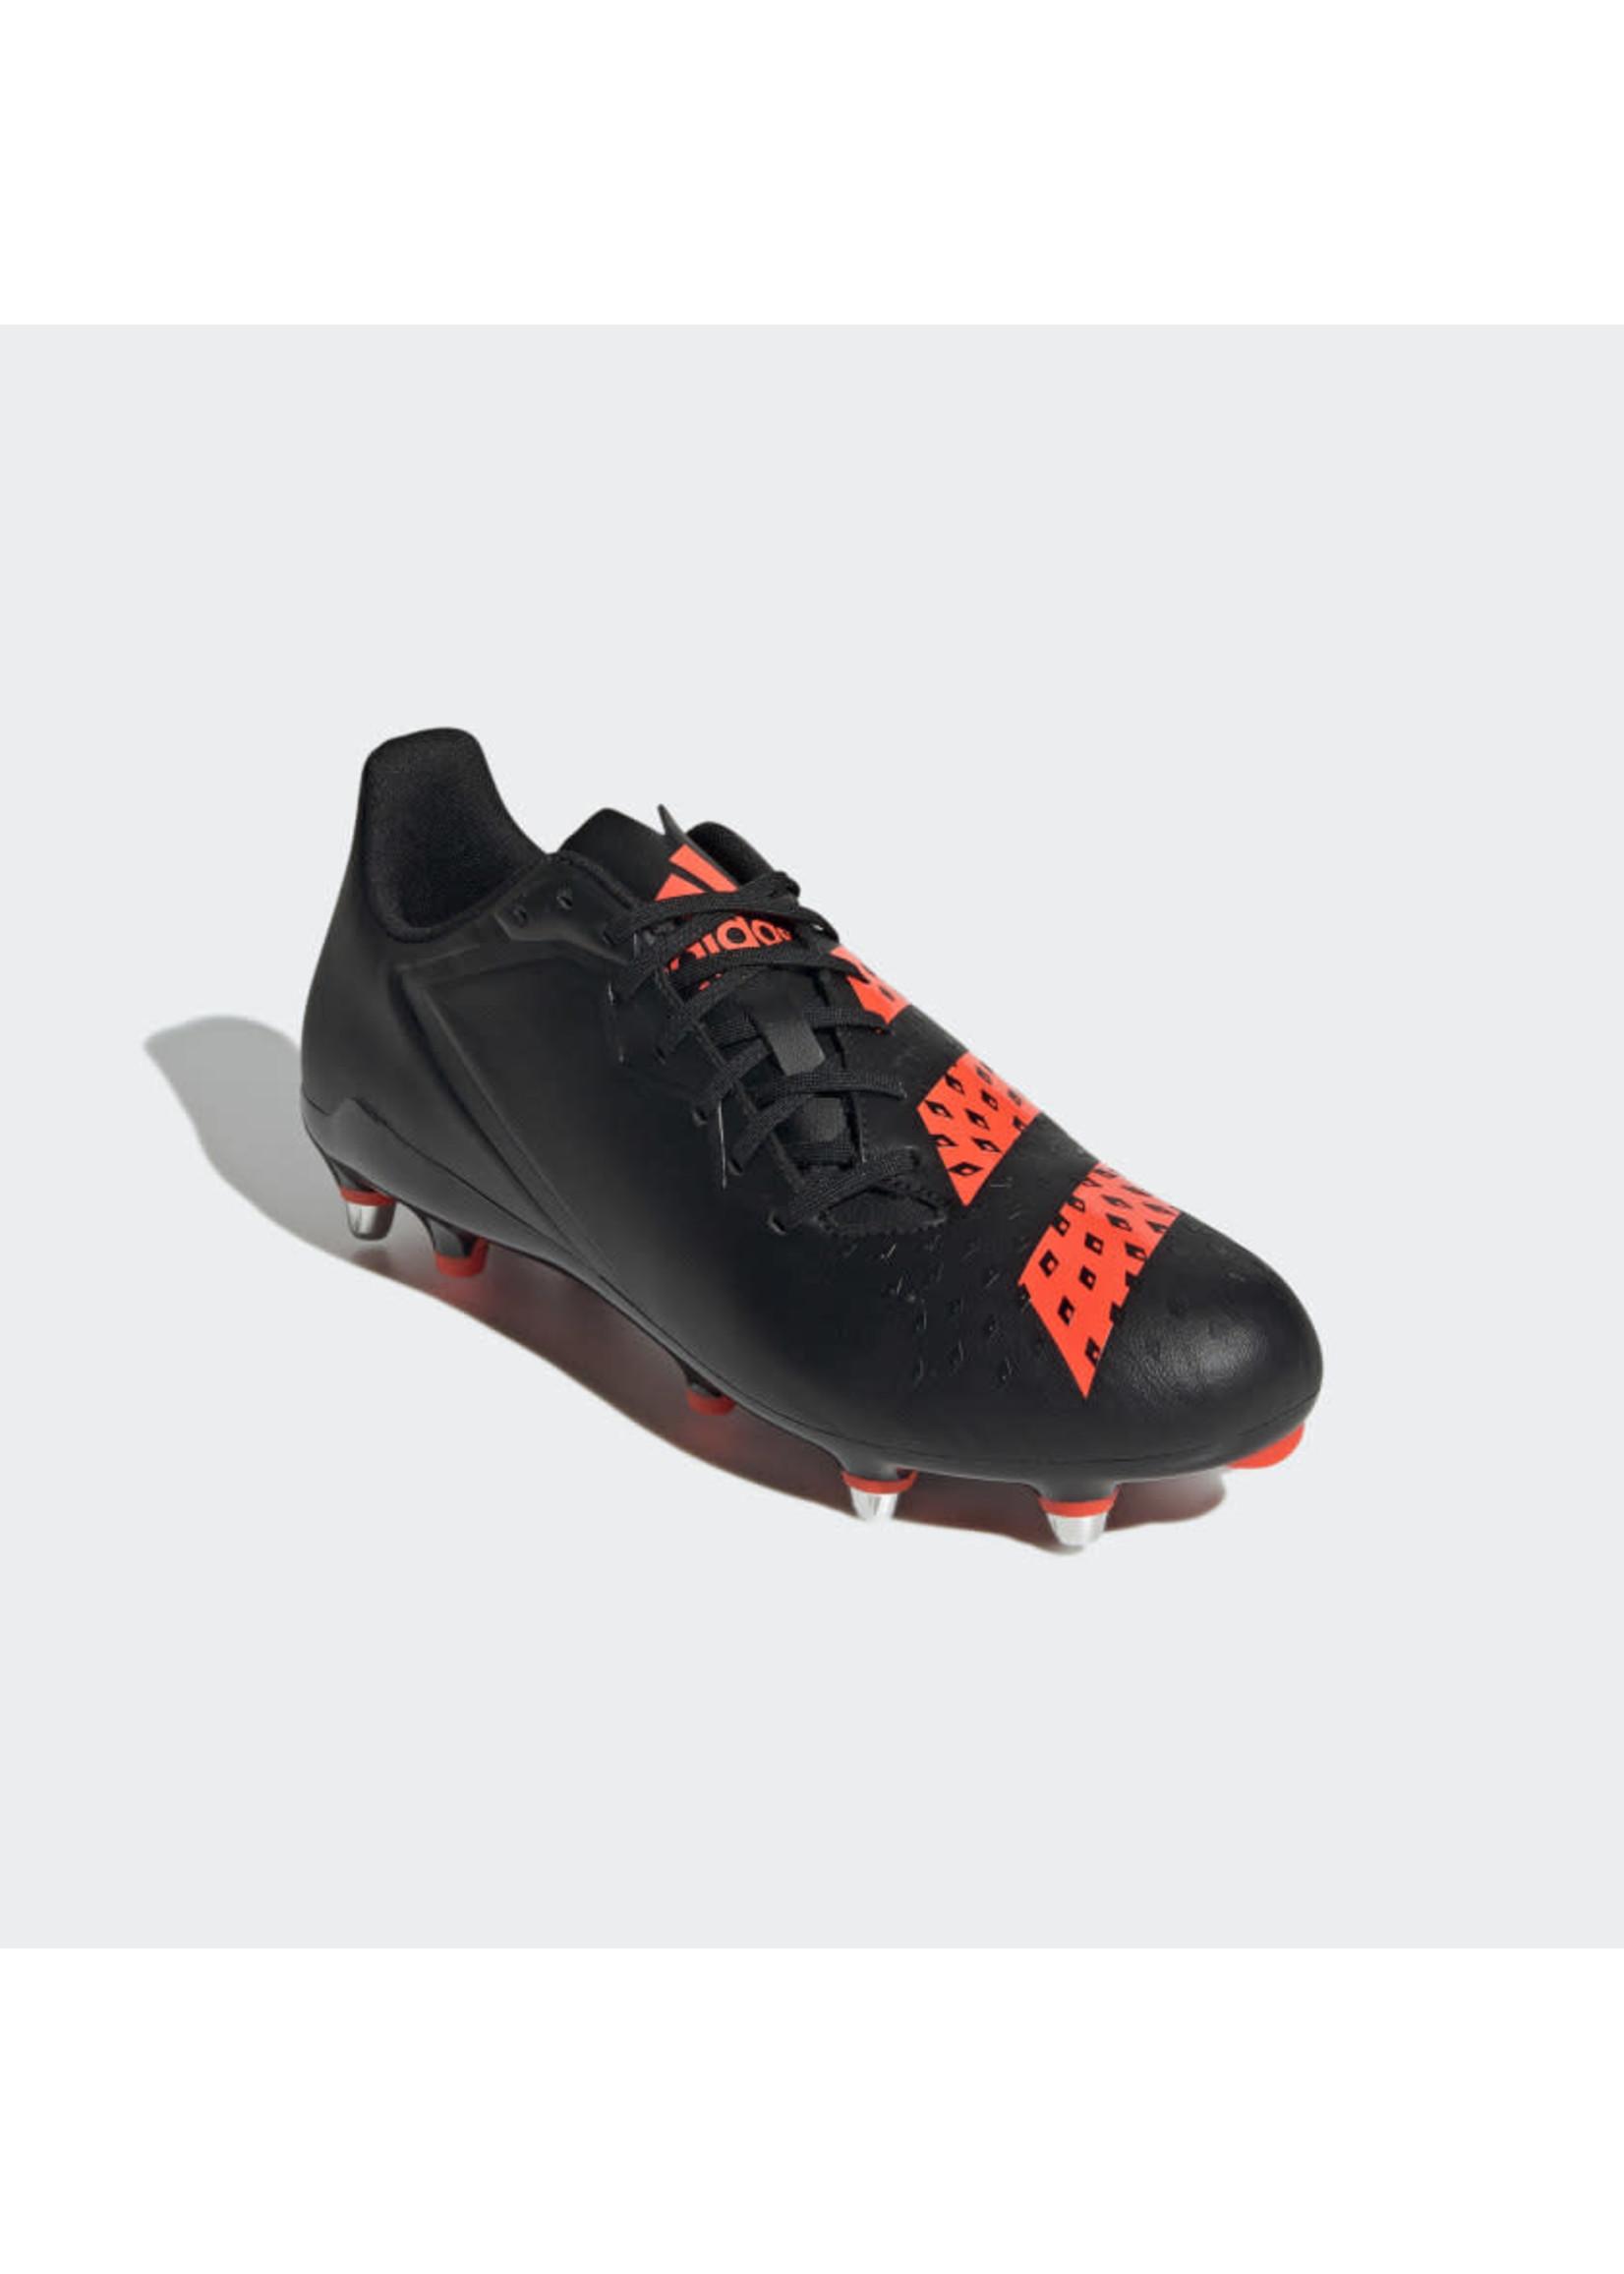 Adidas Adidas Malice Adult Rugby Boot - SG (2021)